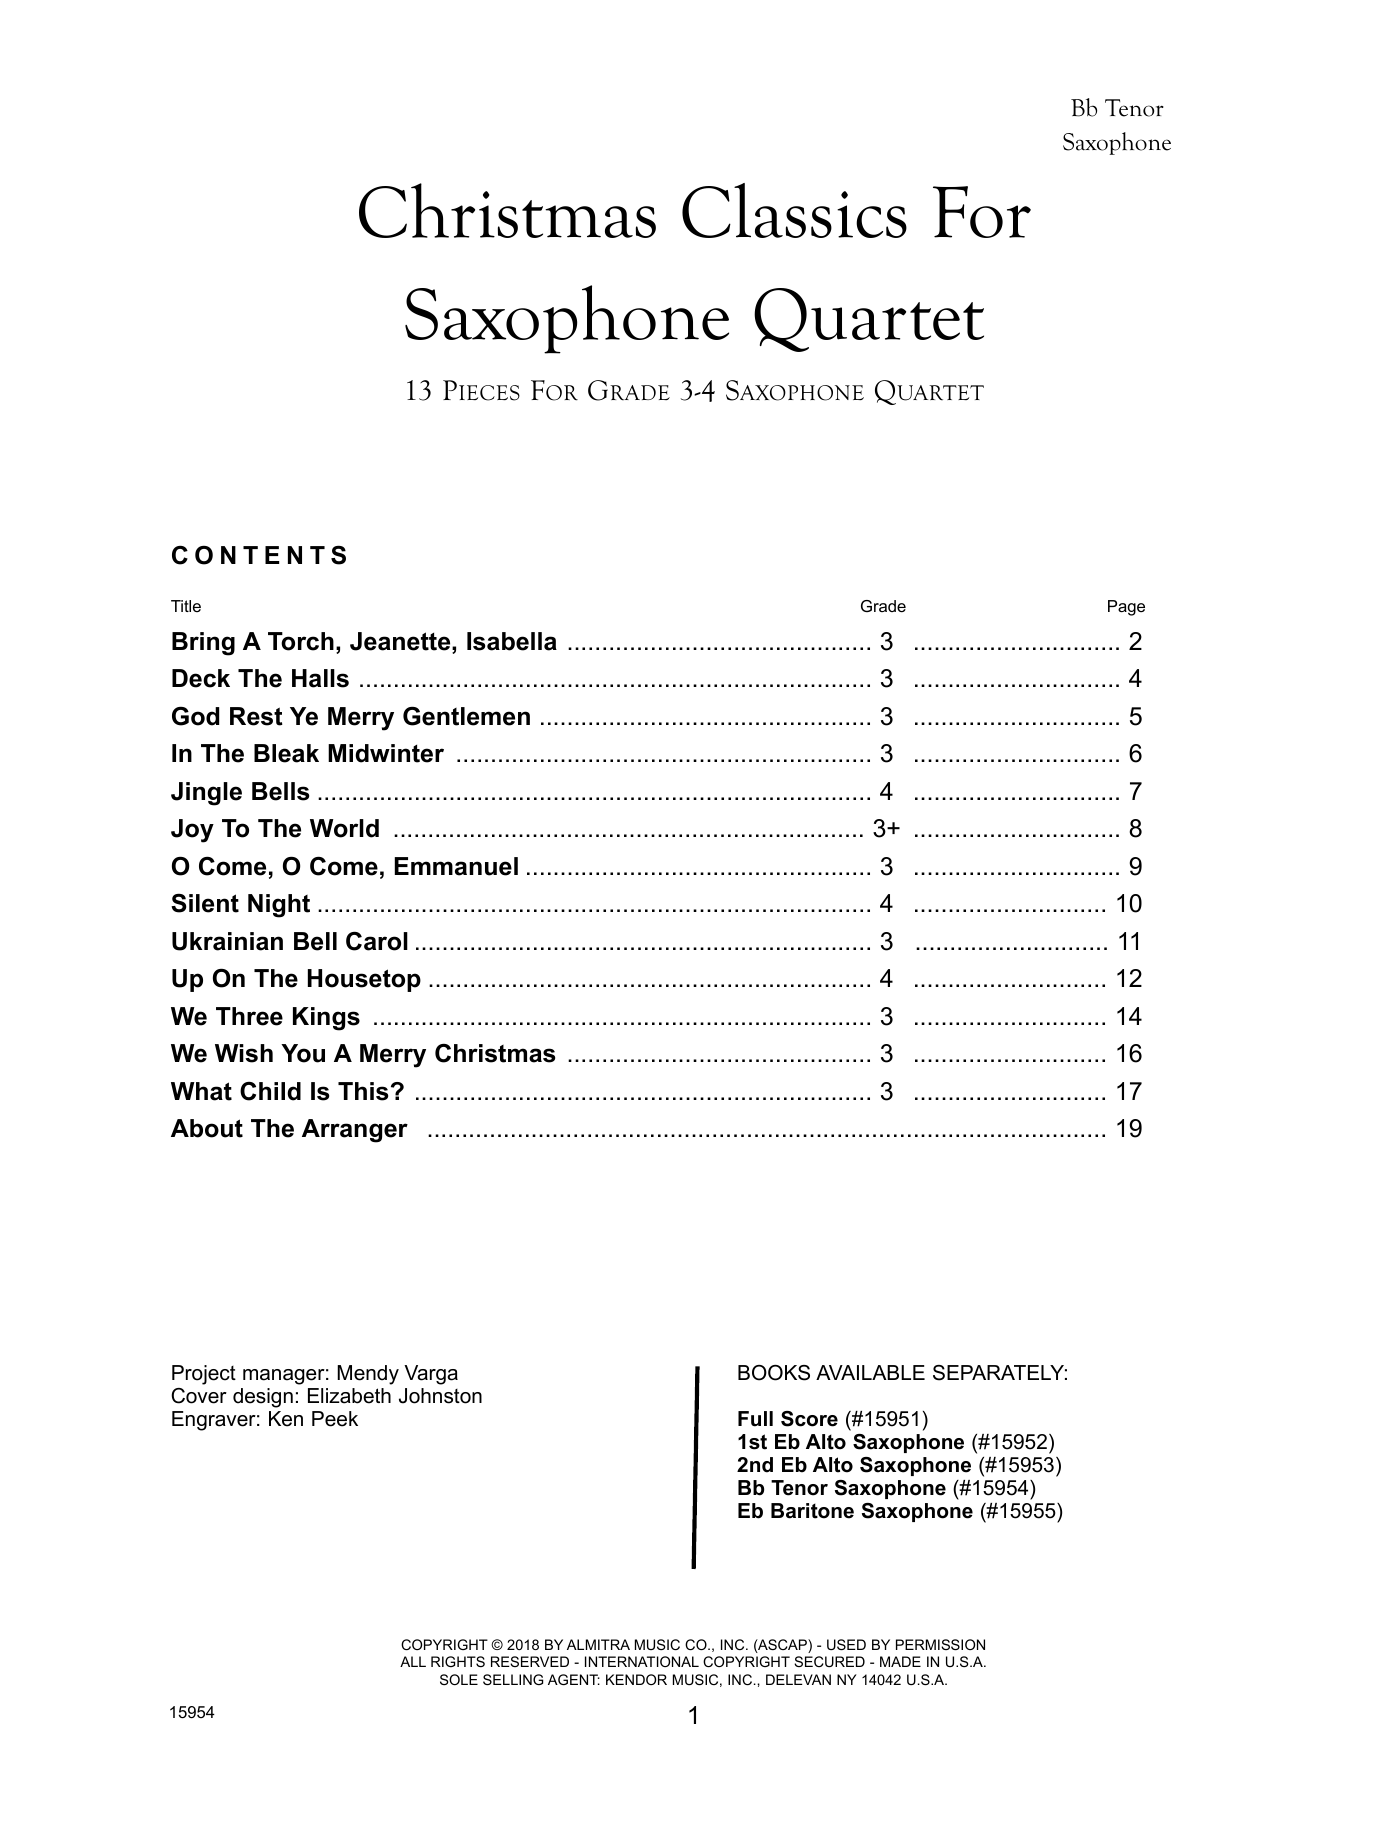 Christmas Classics For Saxophone Quartet - Bb Tenor Saxophone Sheet Music